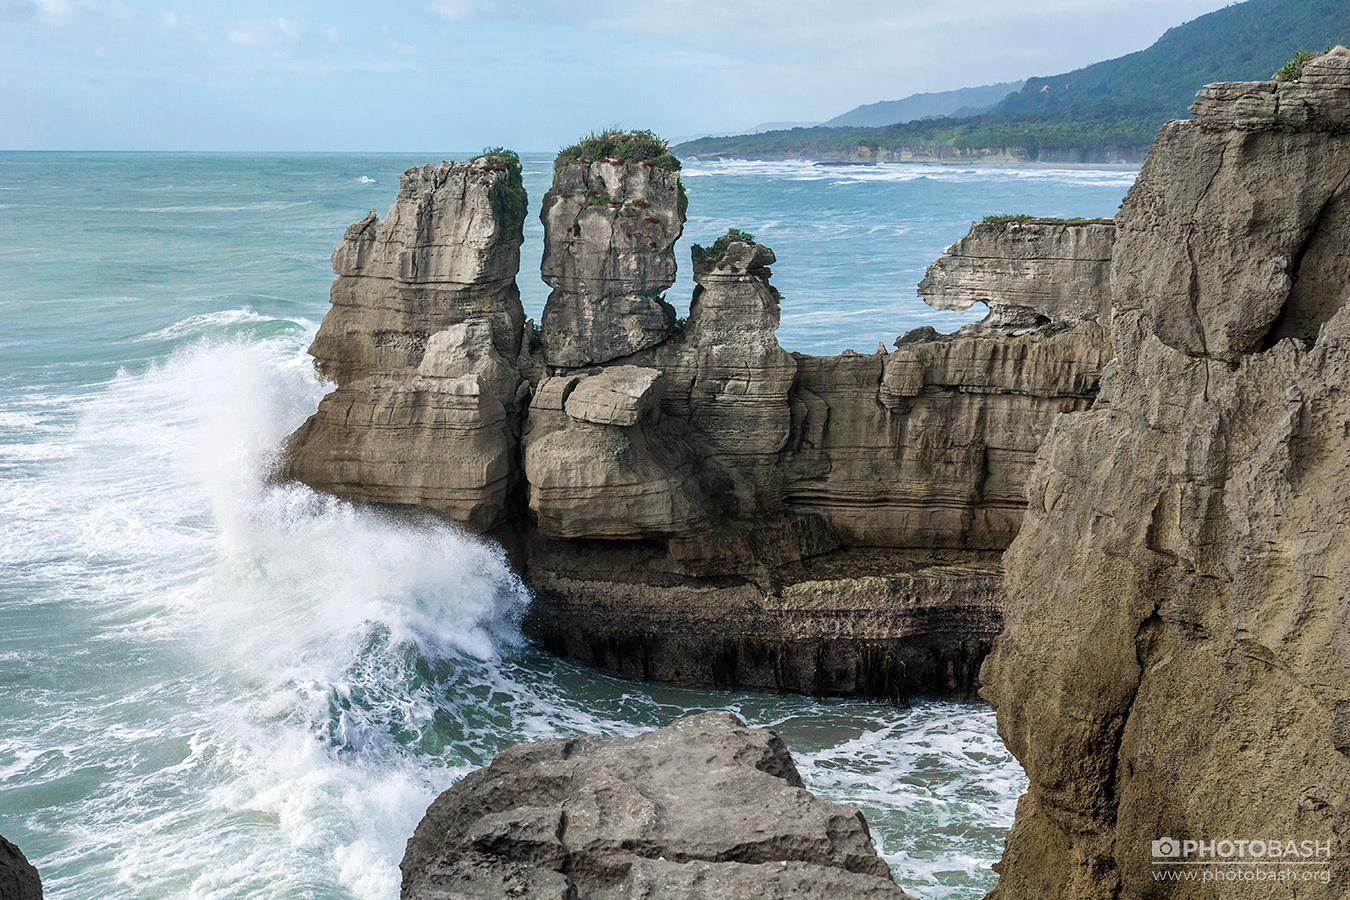 Eroded-Coastline-Cliff-Rocks-Waves.jpg